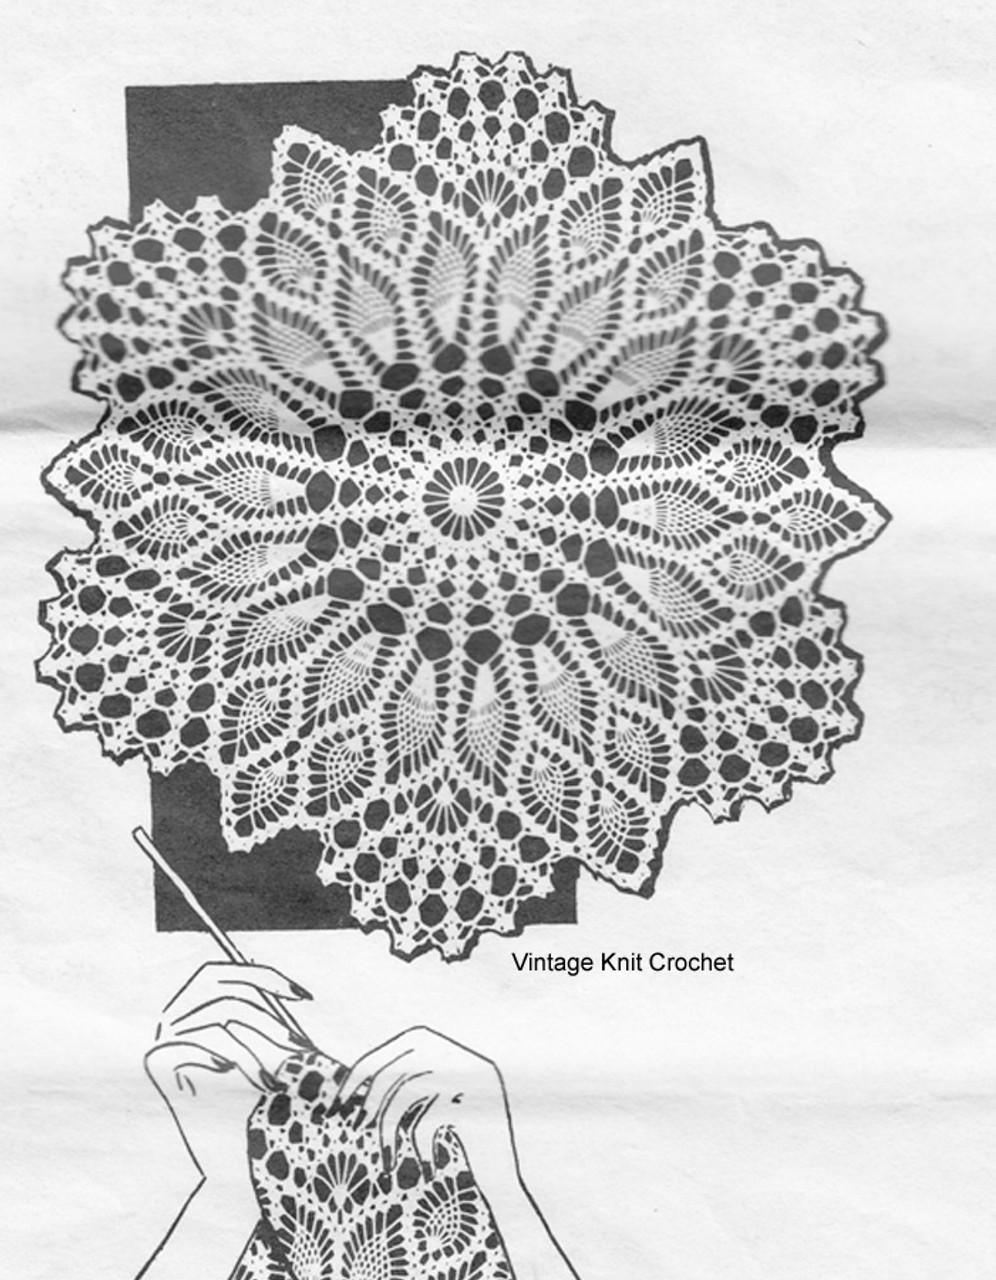 Pineapple Crochet Centerpiece Doily Pattern, Alice Brooks 7327